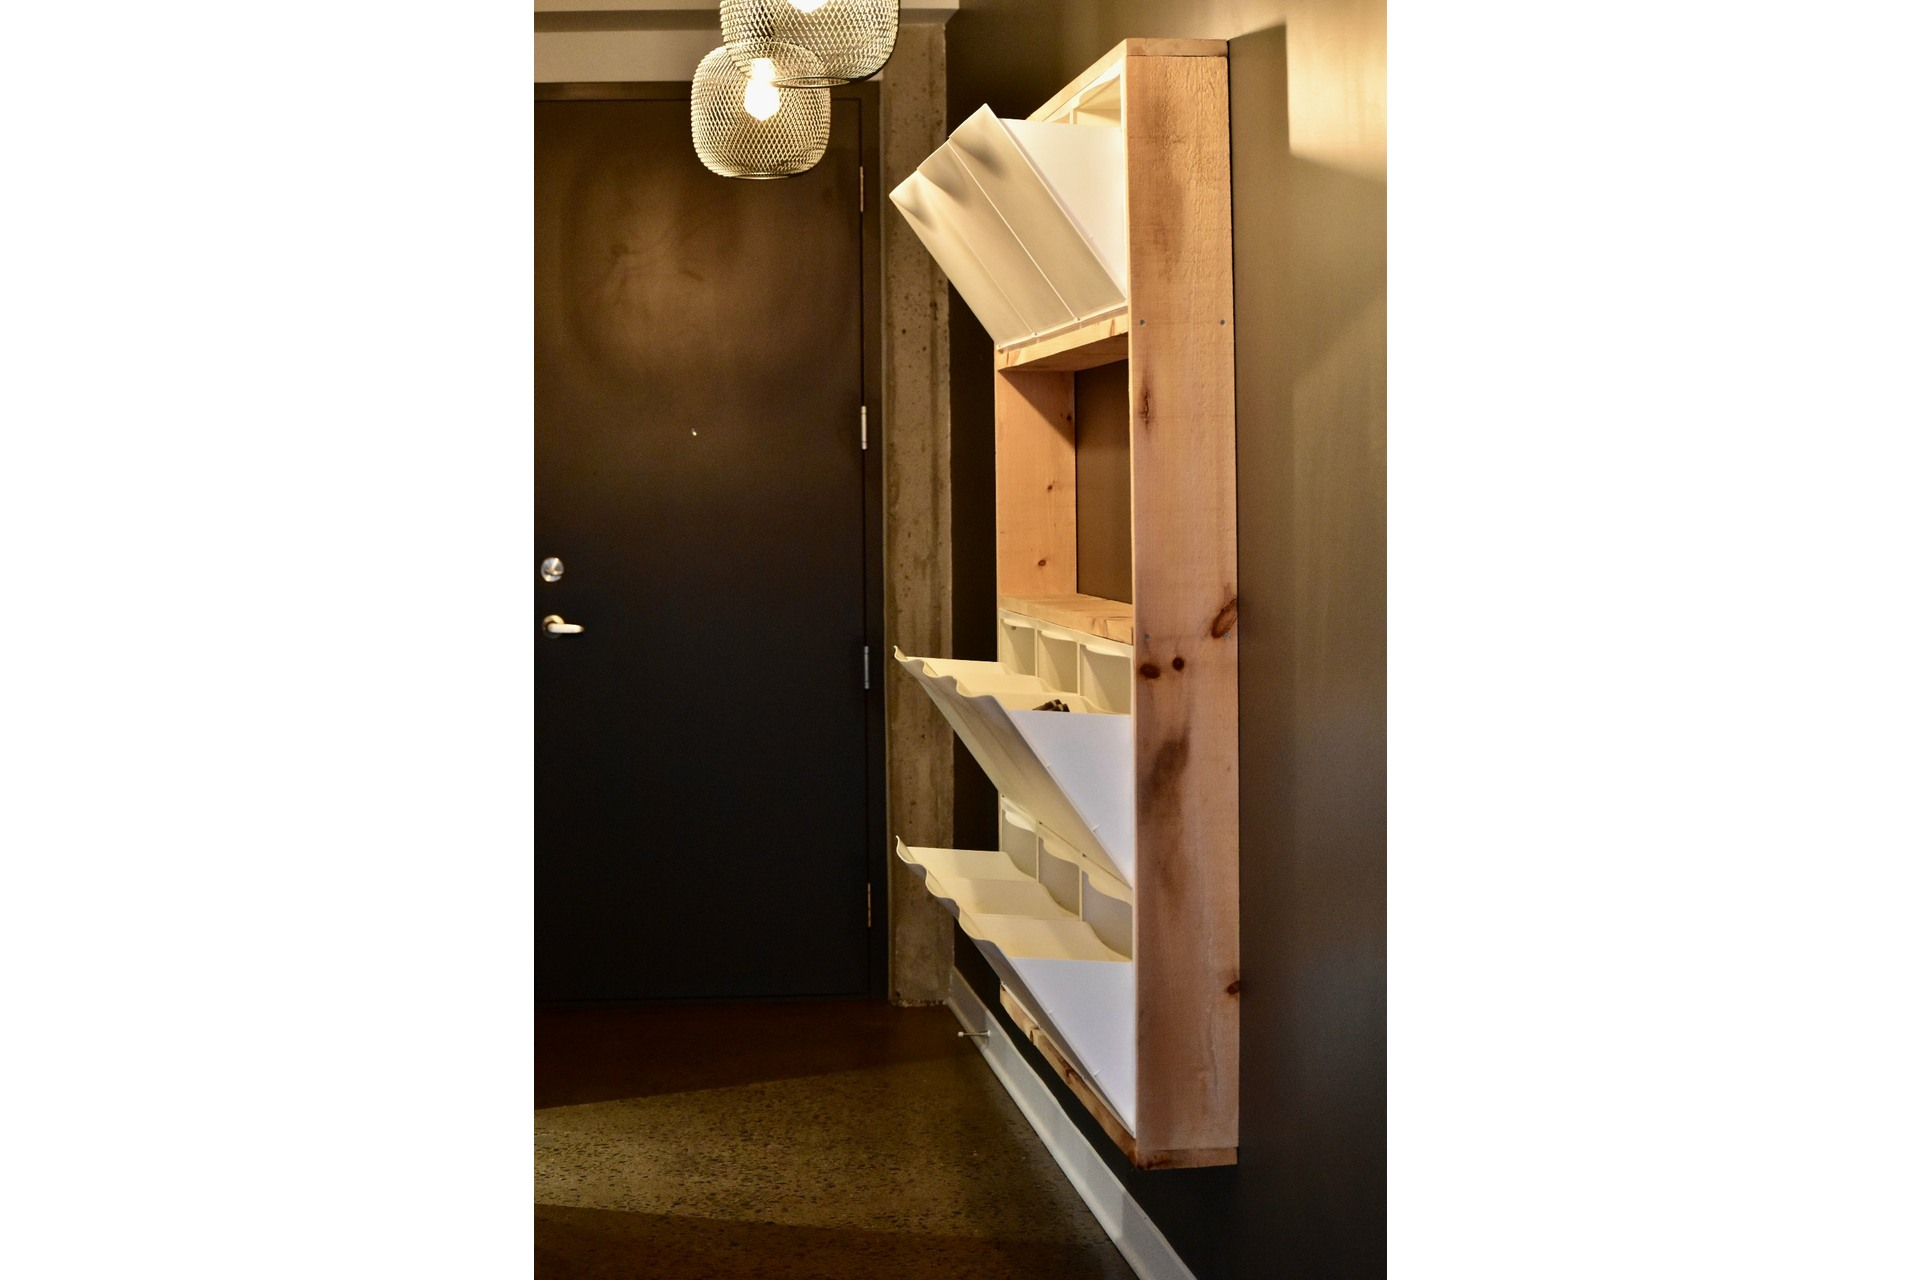 image 25 - Departamento Para alquiler Villeray/Saint-Michel/Parc-Extension Montréal  - 5 habitaciones